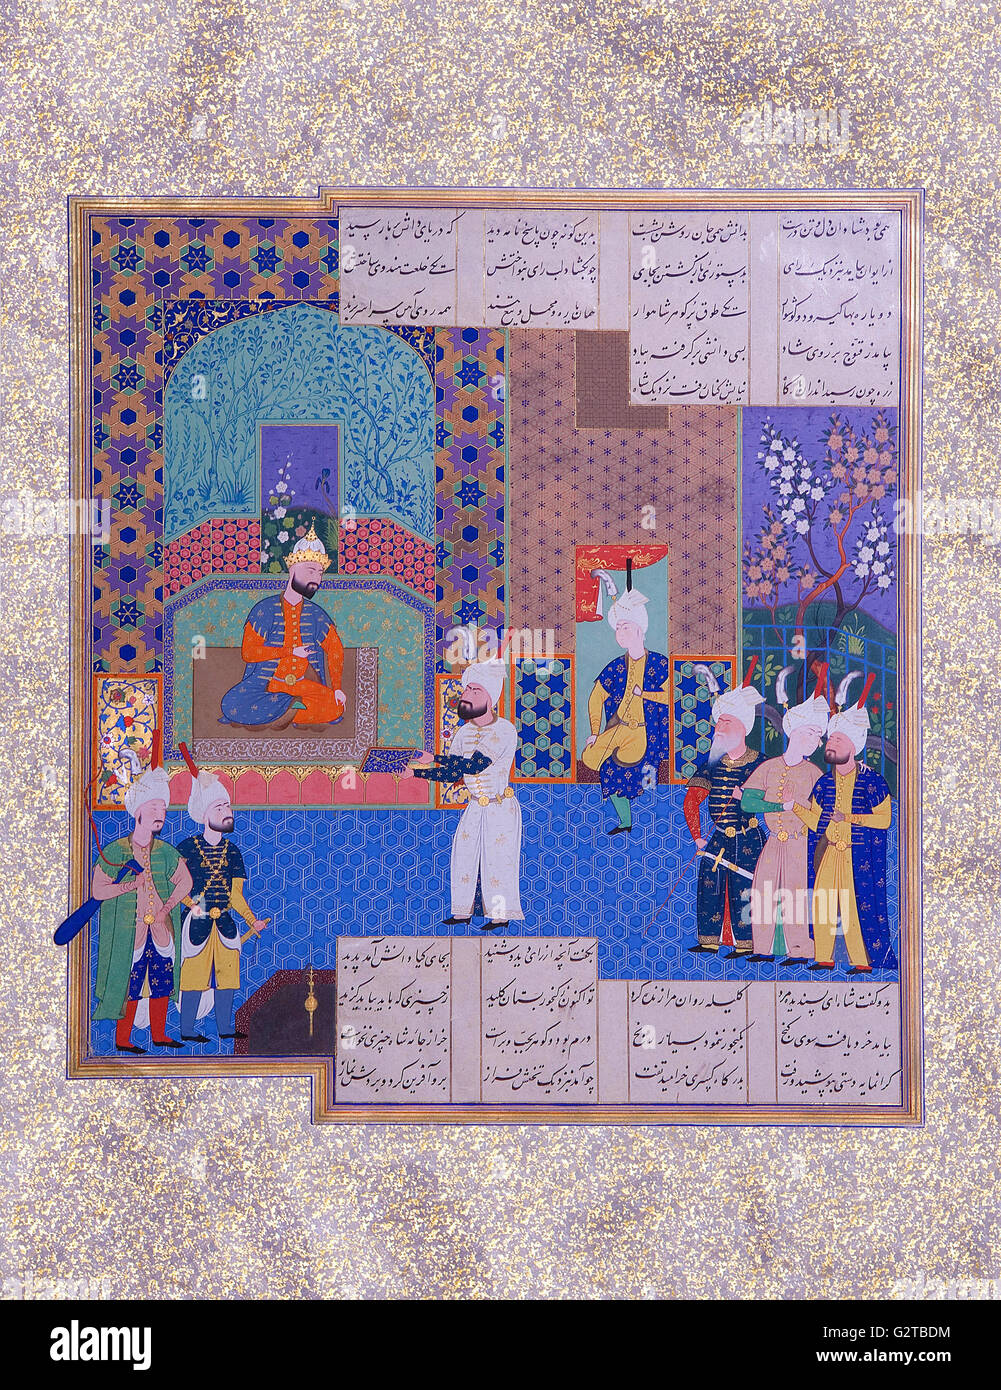 Desconocida, Irán, Siglo XVI - Ilustración - Imagen De Stock